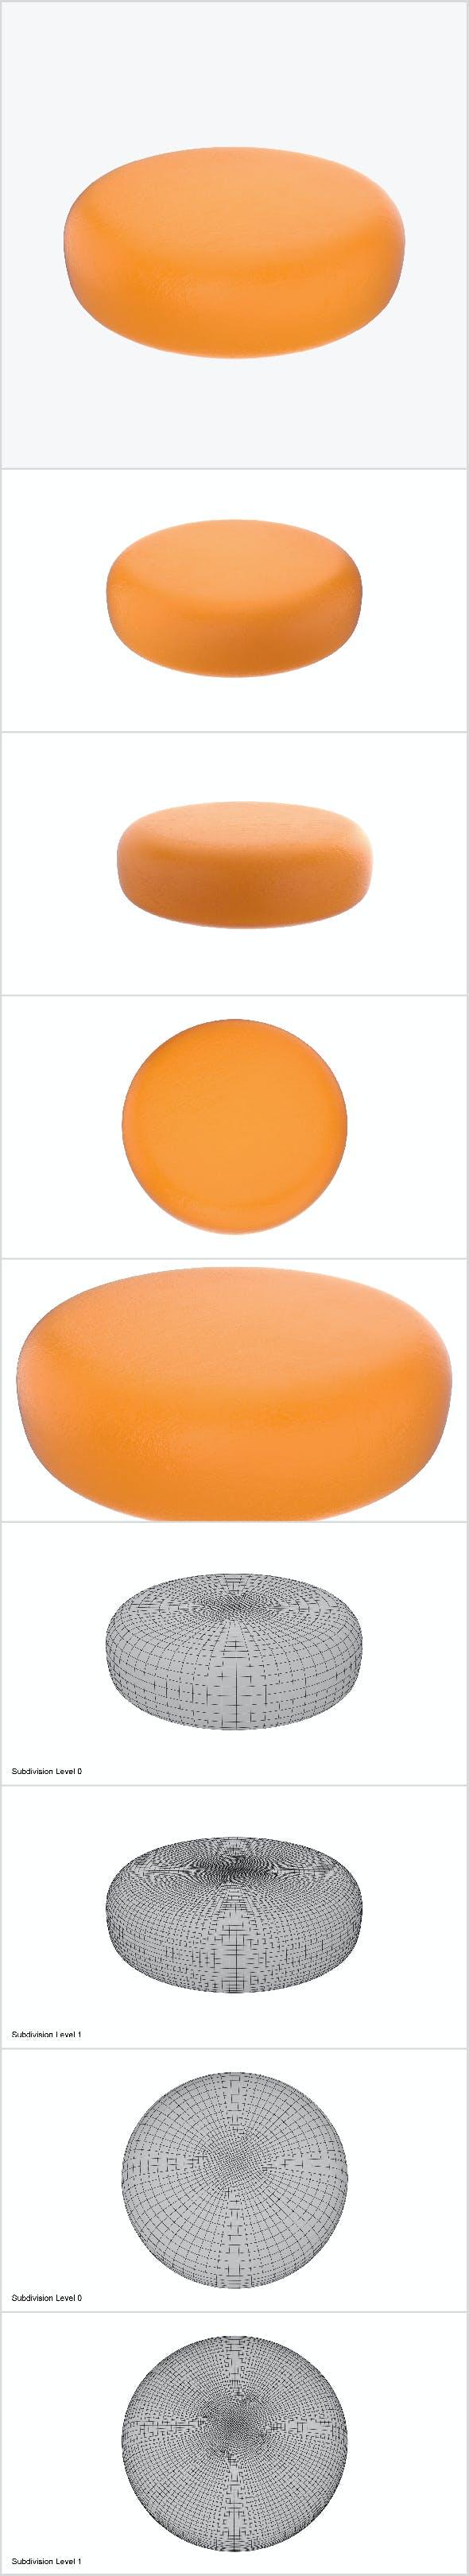 Cheese wheel full - 3DOcean Item for Sale